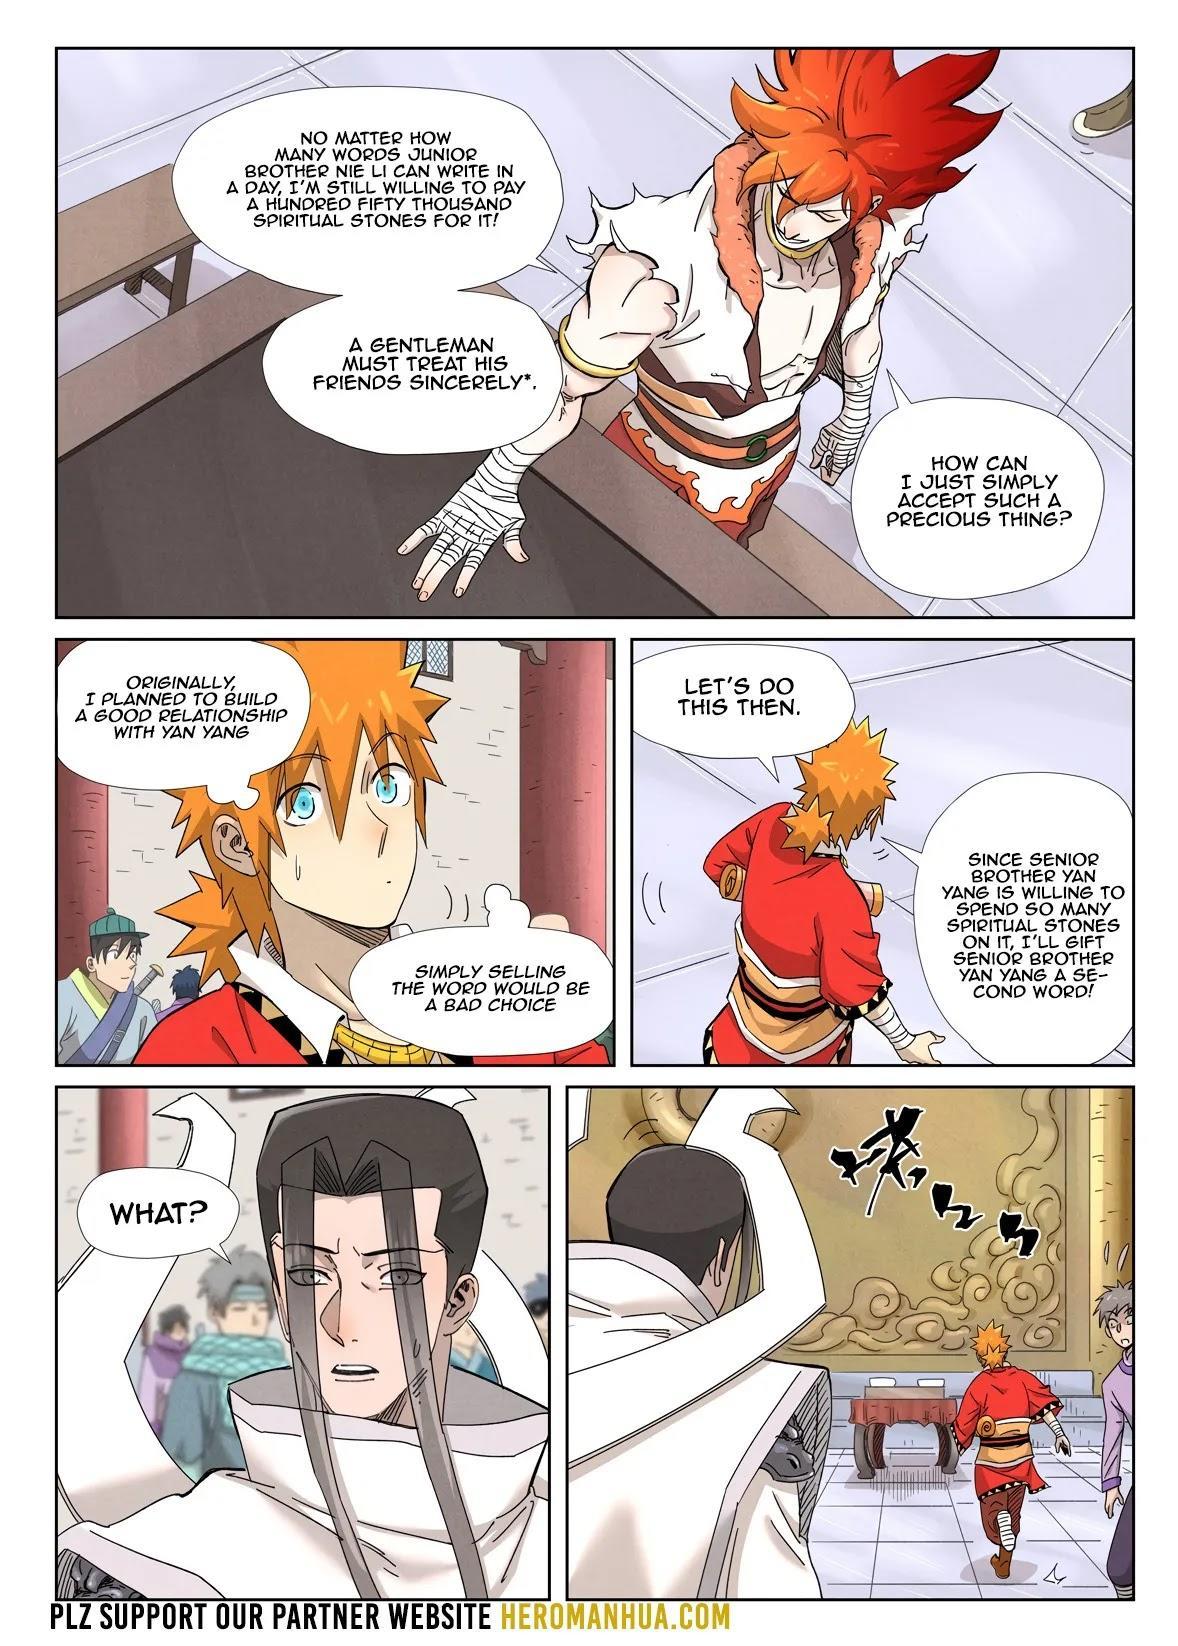 Tales Of Demons And Gods Chapter 342.1 page 6 - Mangakakalot